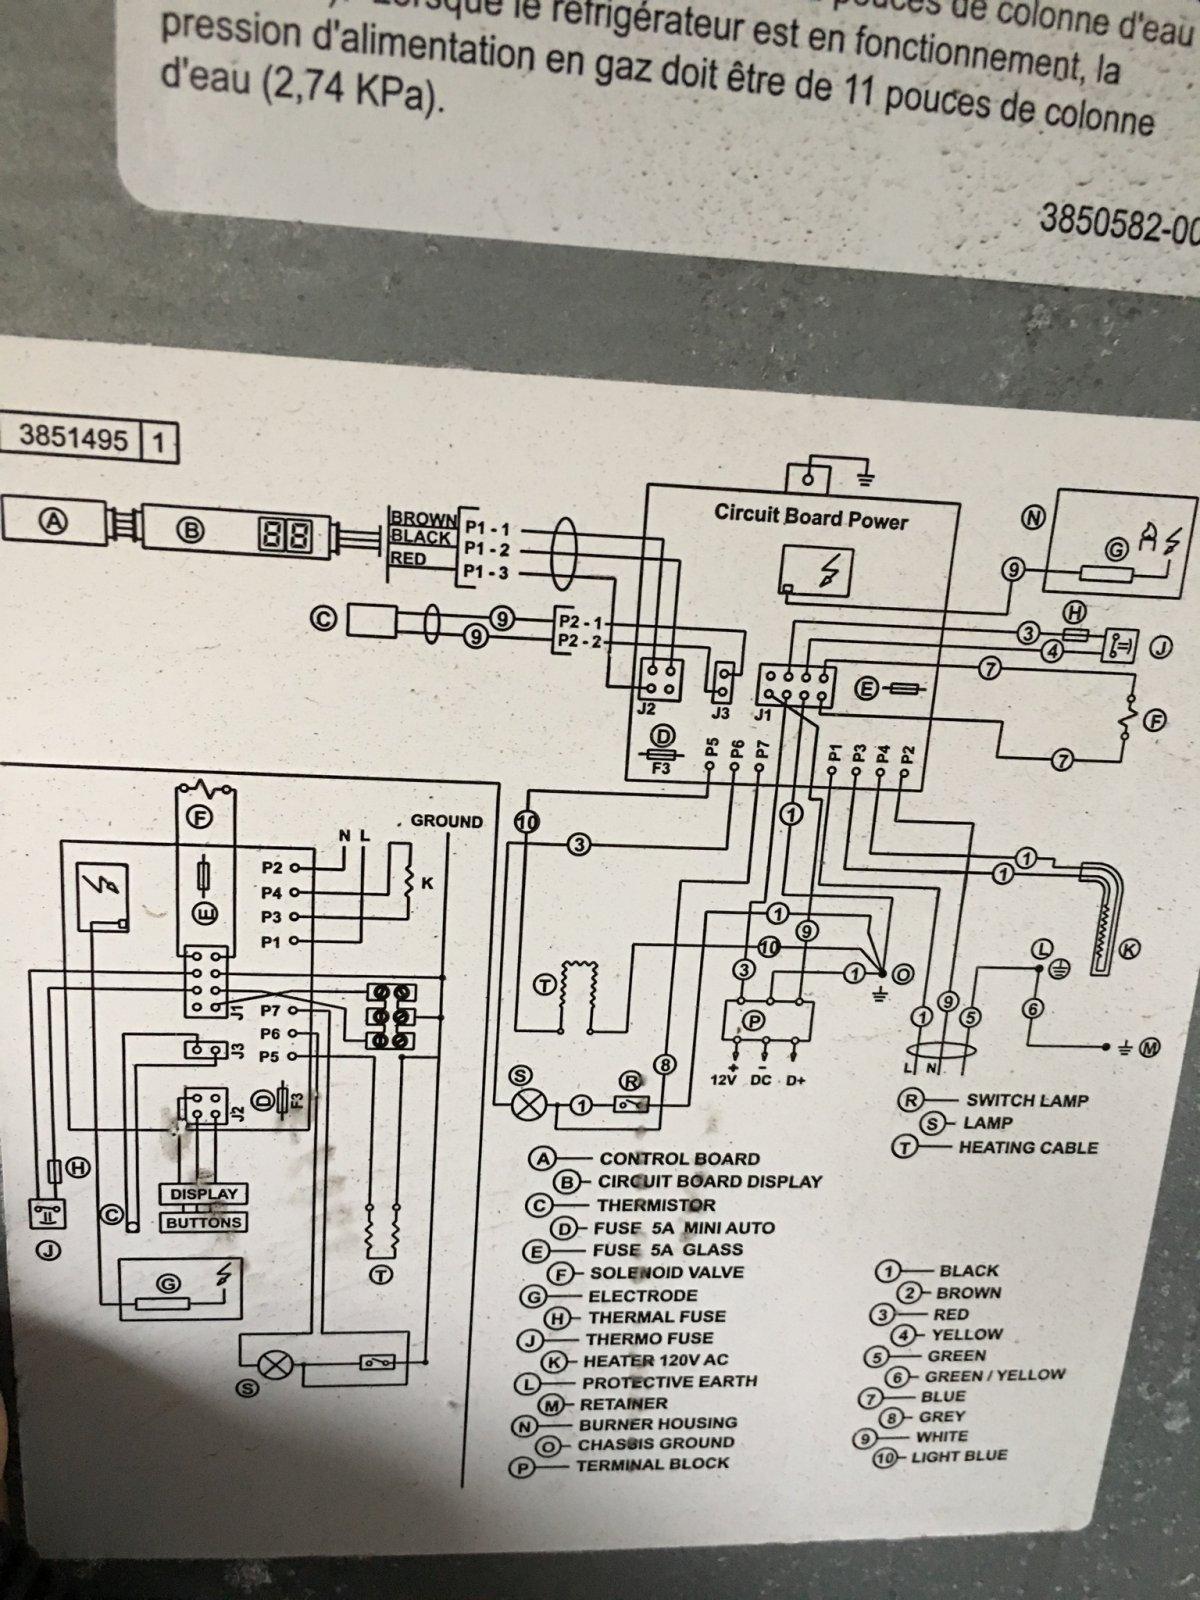 Colorful Burner Wiring Diagram Thermistor Mold - Wiring Standart ...